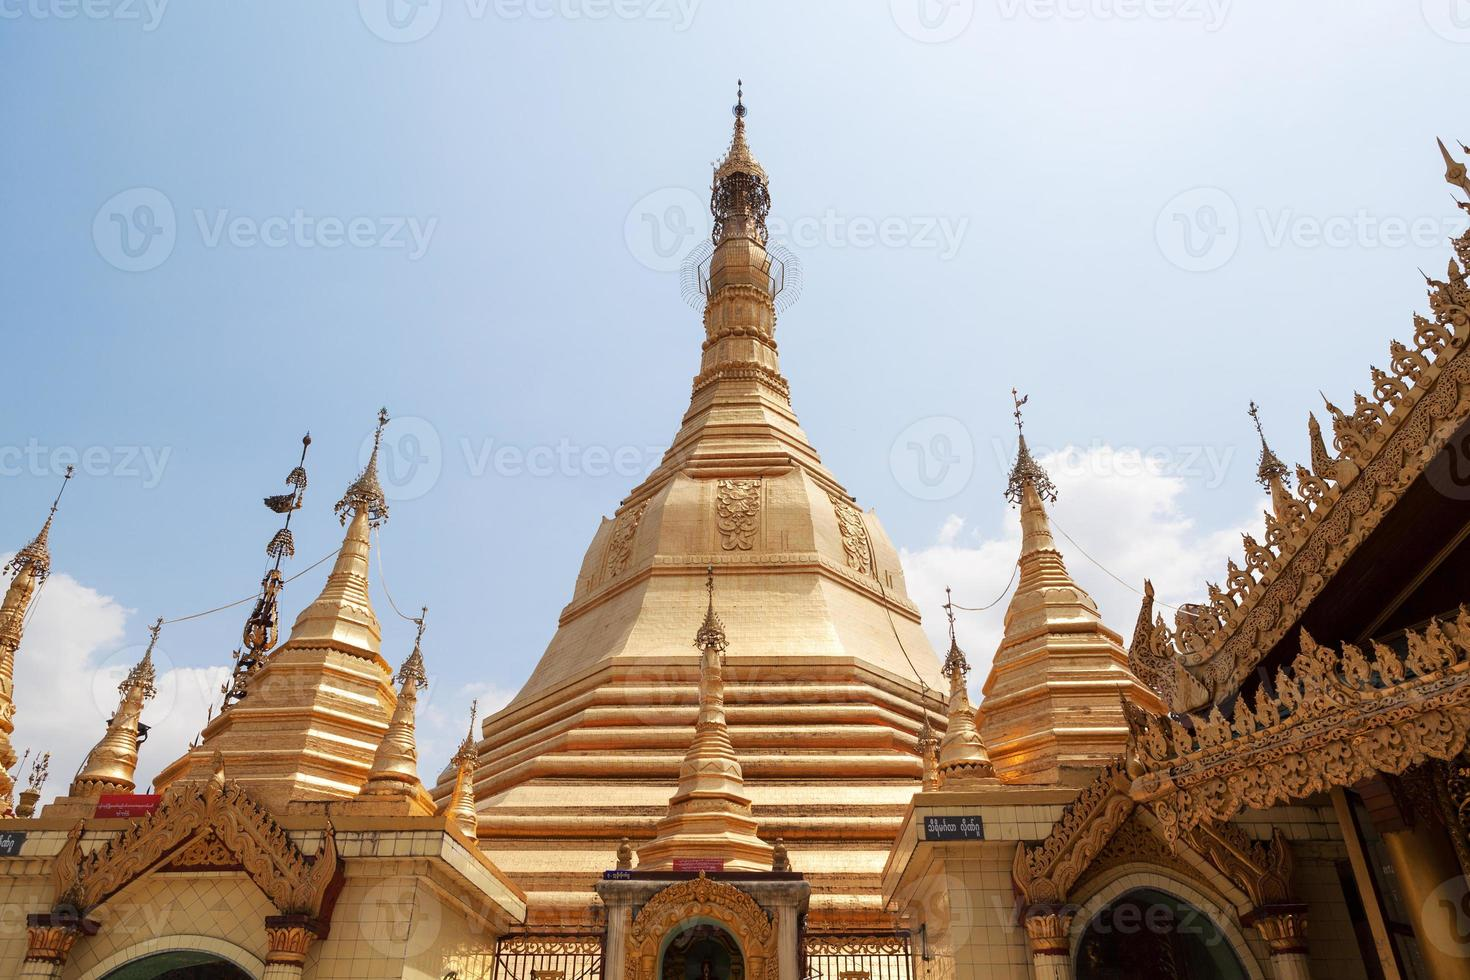 Sule pagoda in Yangon, Burma (Myanmar) photo